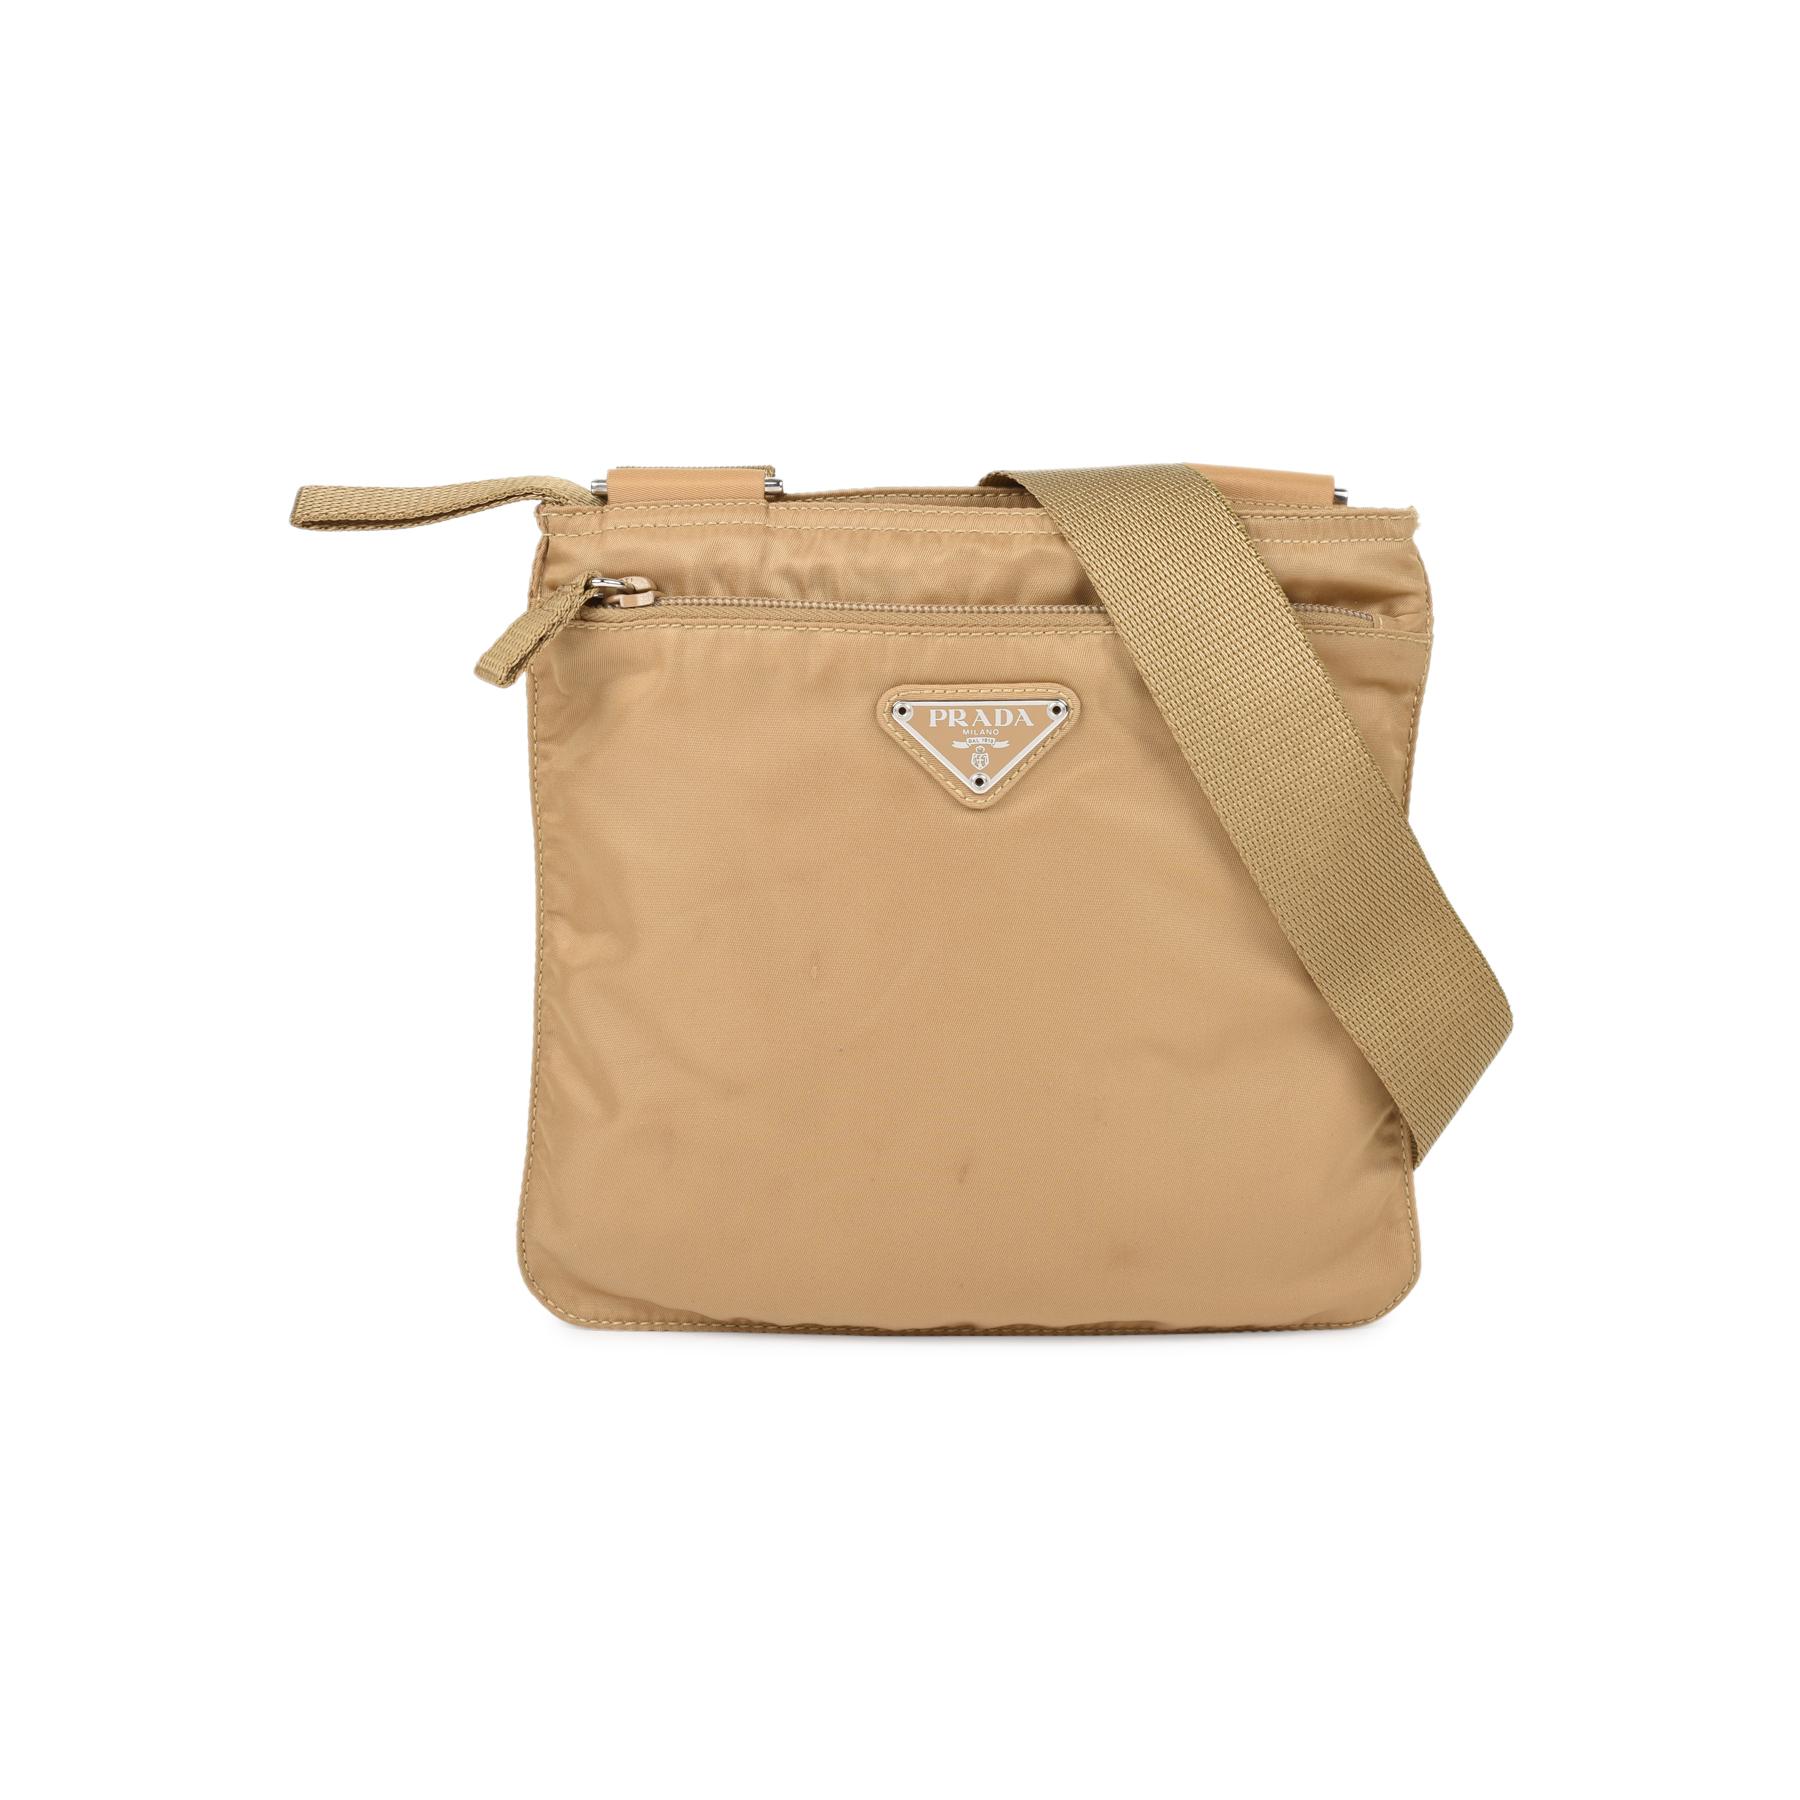 a4b8a01e1514 123456789101112 1855b 3b9fc  netherlands second hand prada nylon messenger  bag brown the fifth collection dc80b 07ada